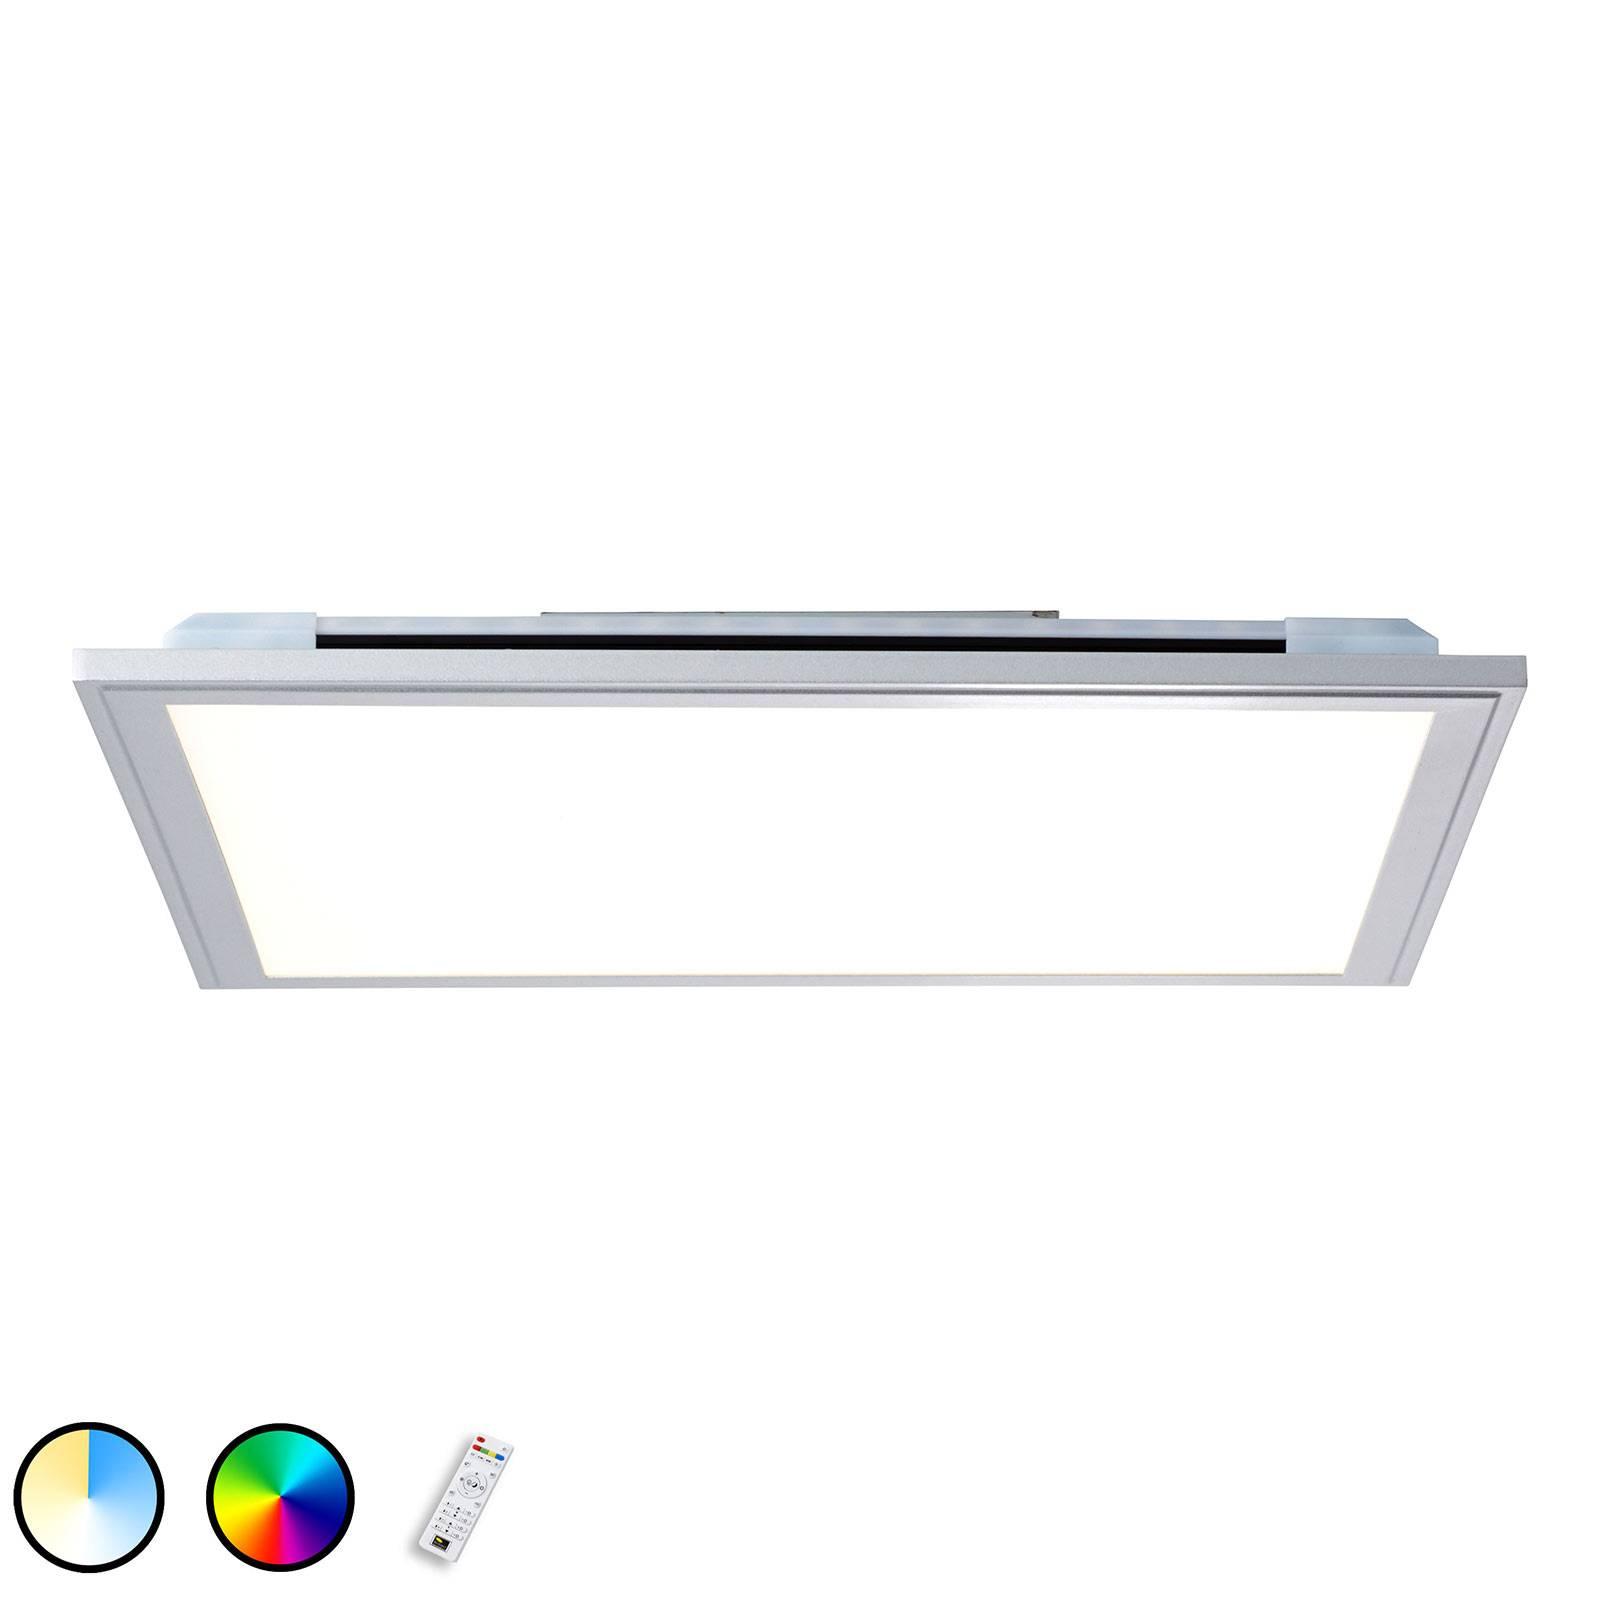 LED plafondlamp Alissa, 59,5x59,5 cm